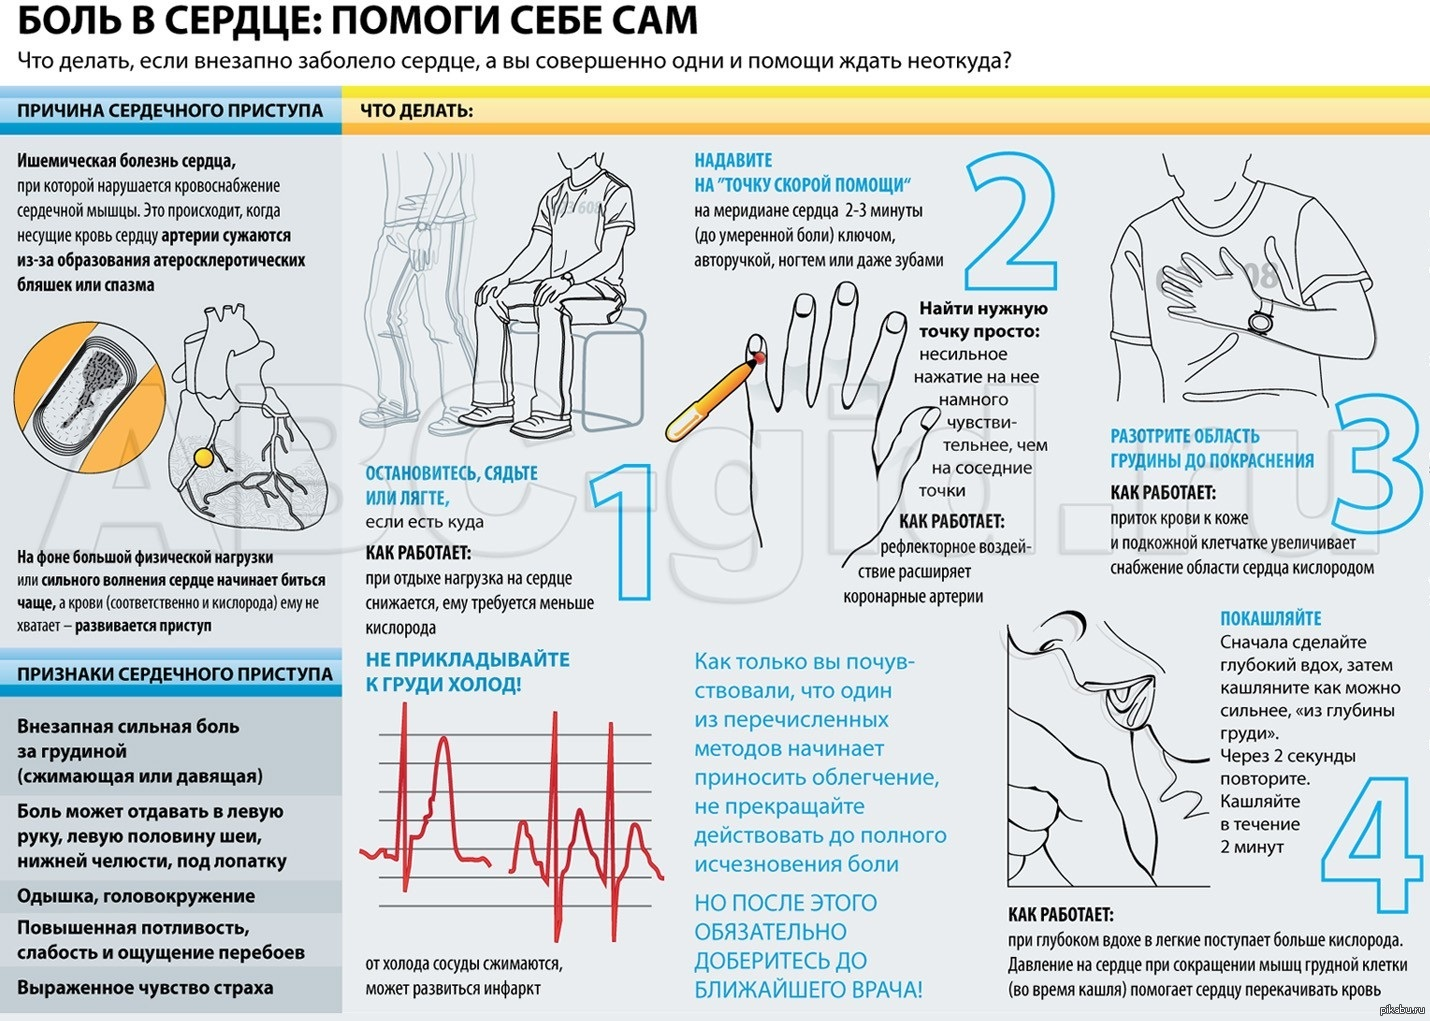 Действия при болезни сердца